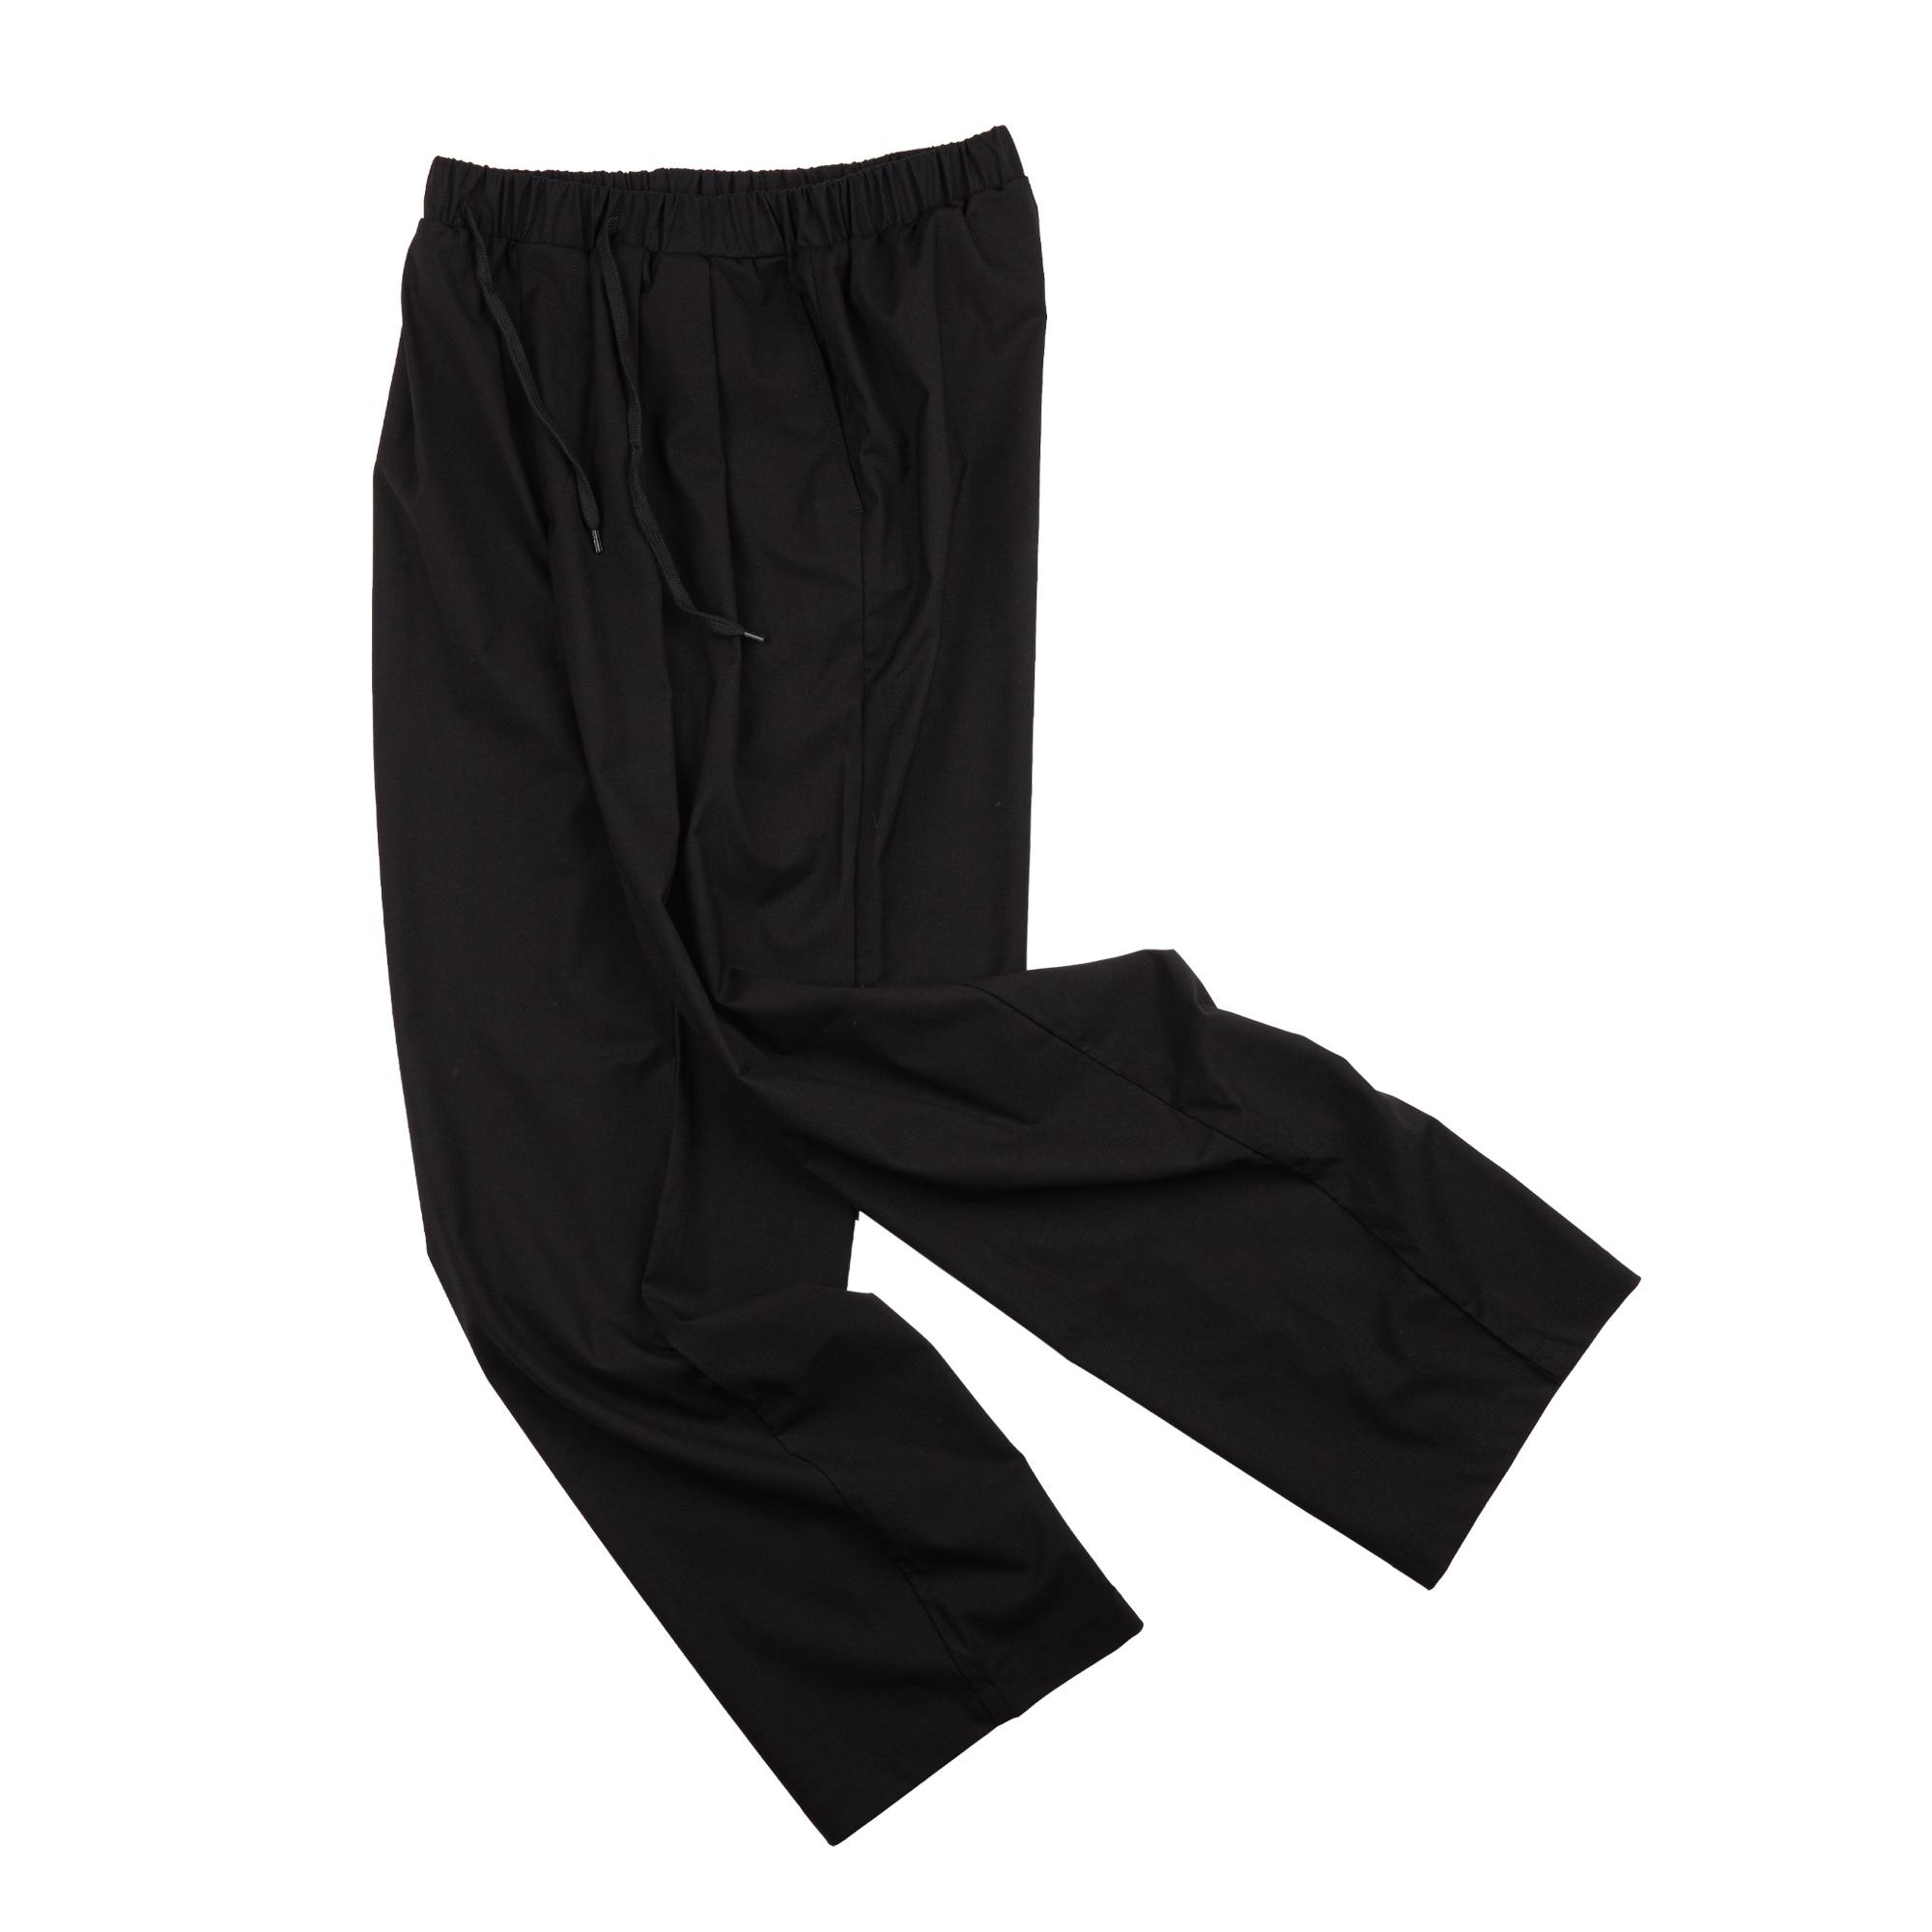 Bandding Slacks-Black